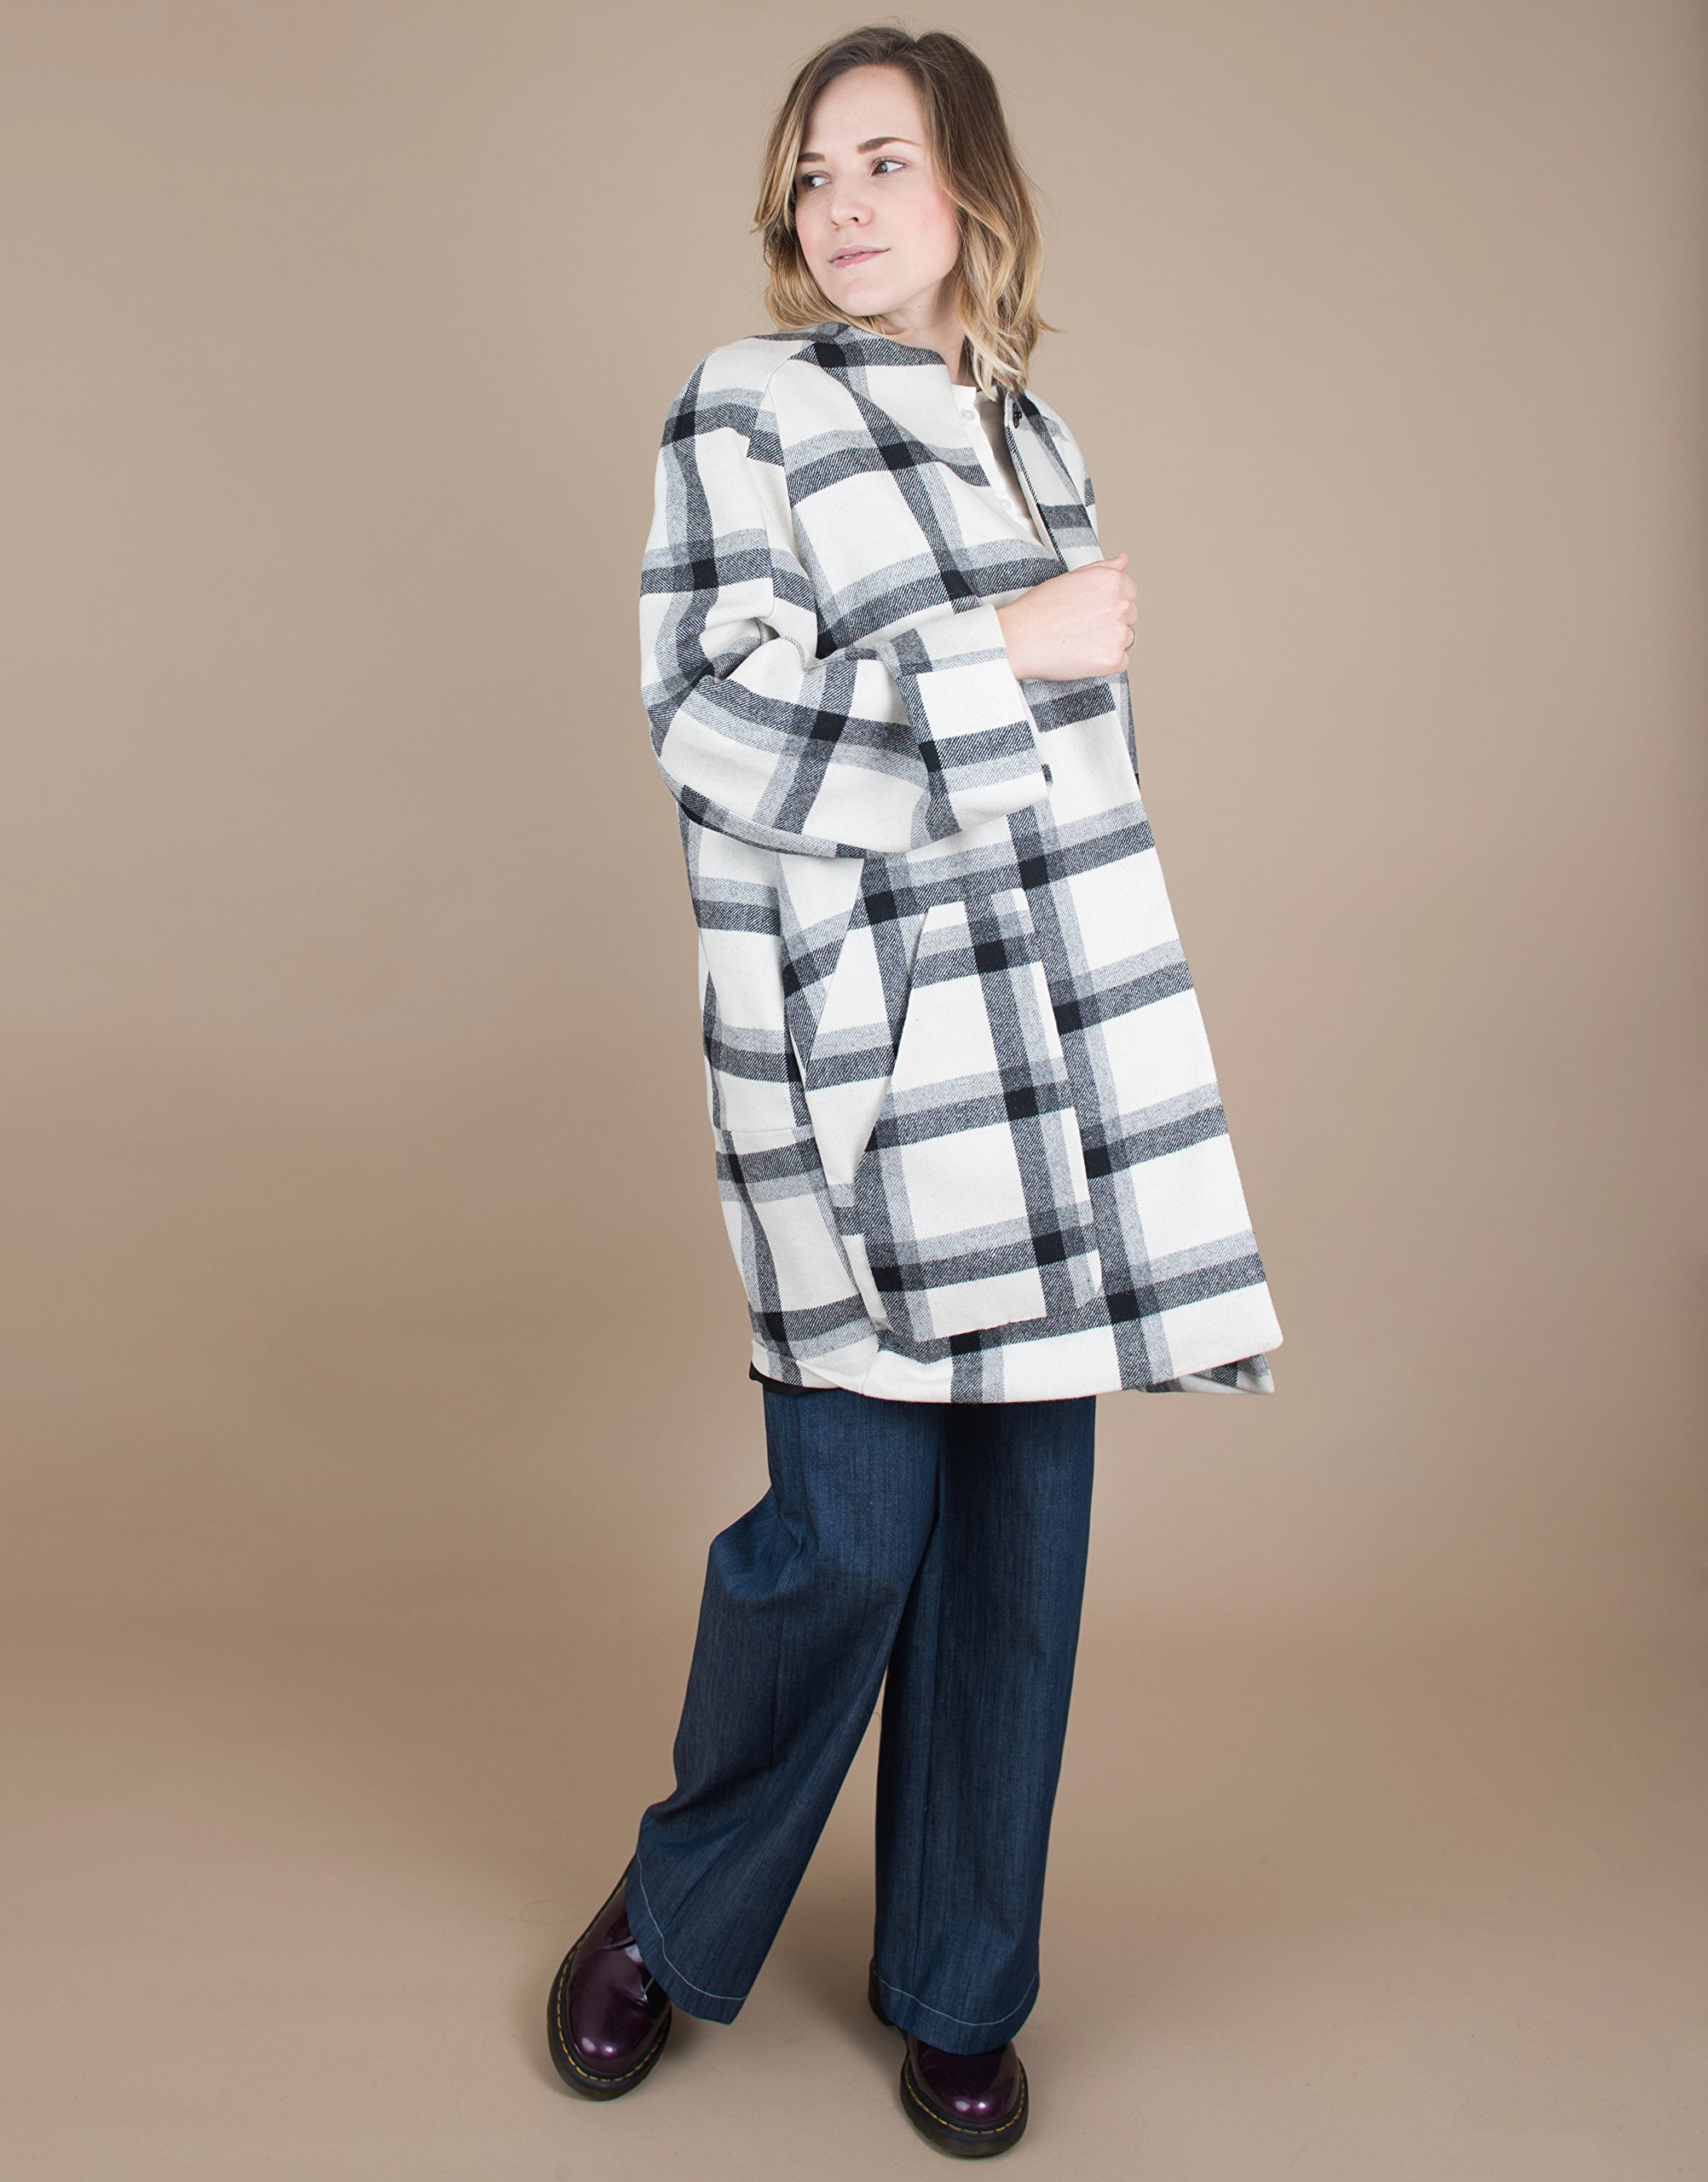 Long Sleeve Black and White Plaid Wool Coat